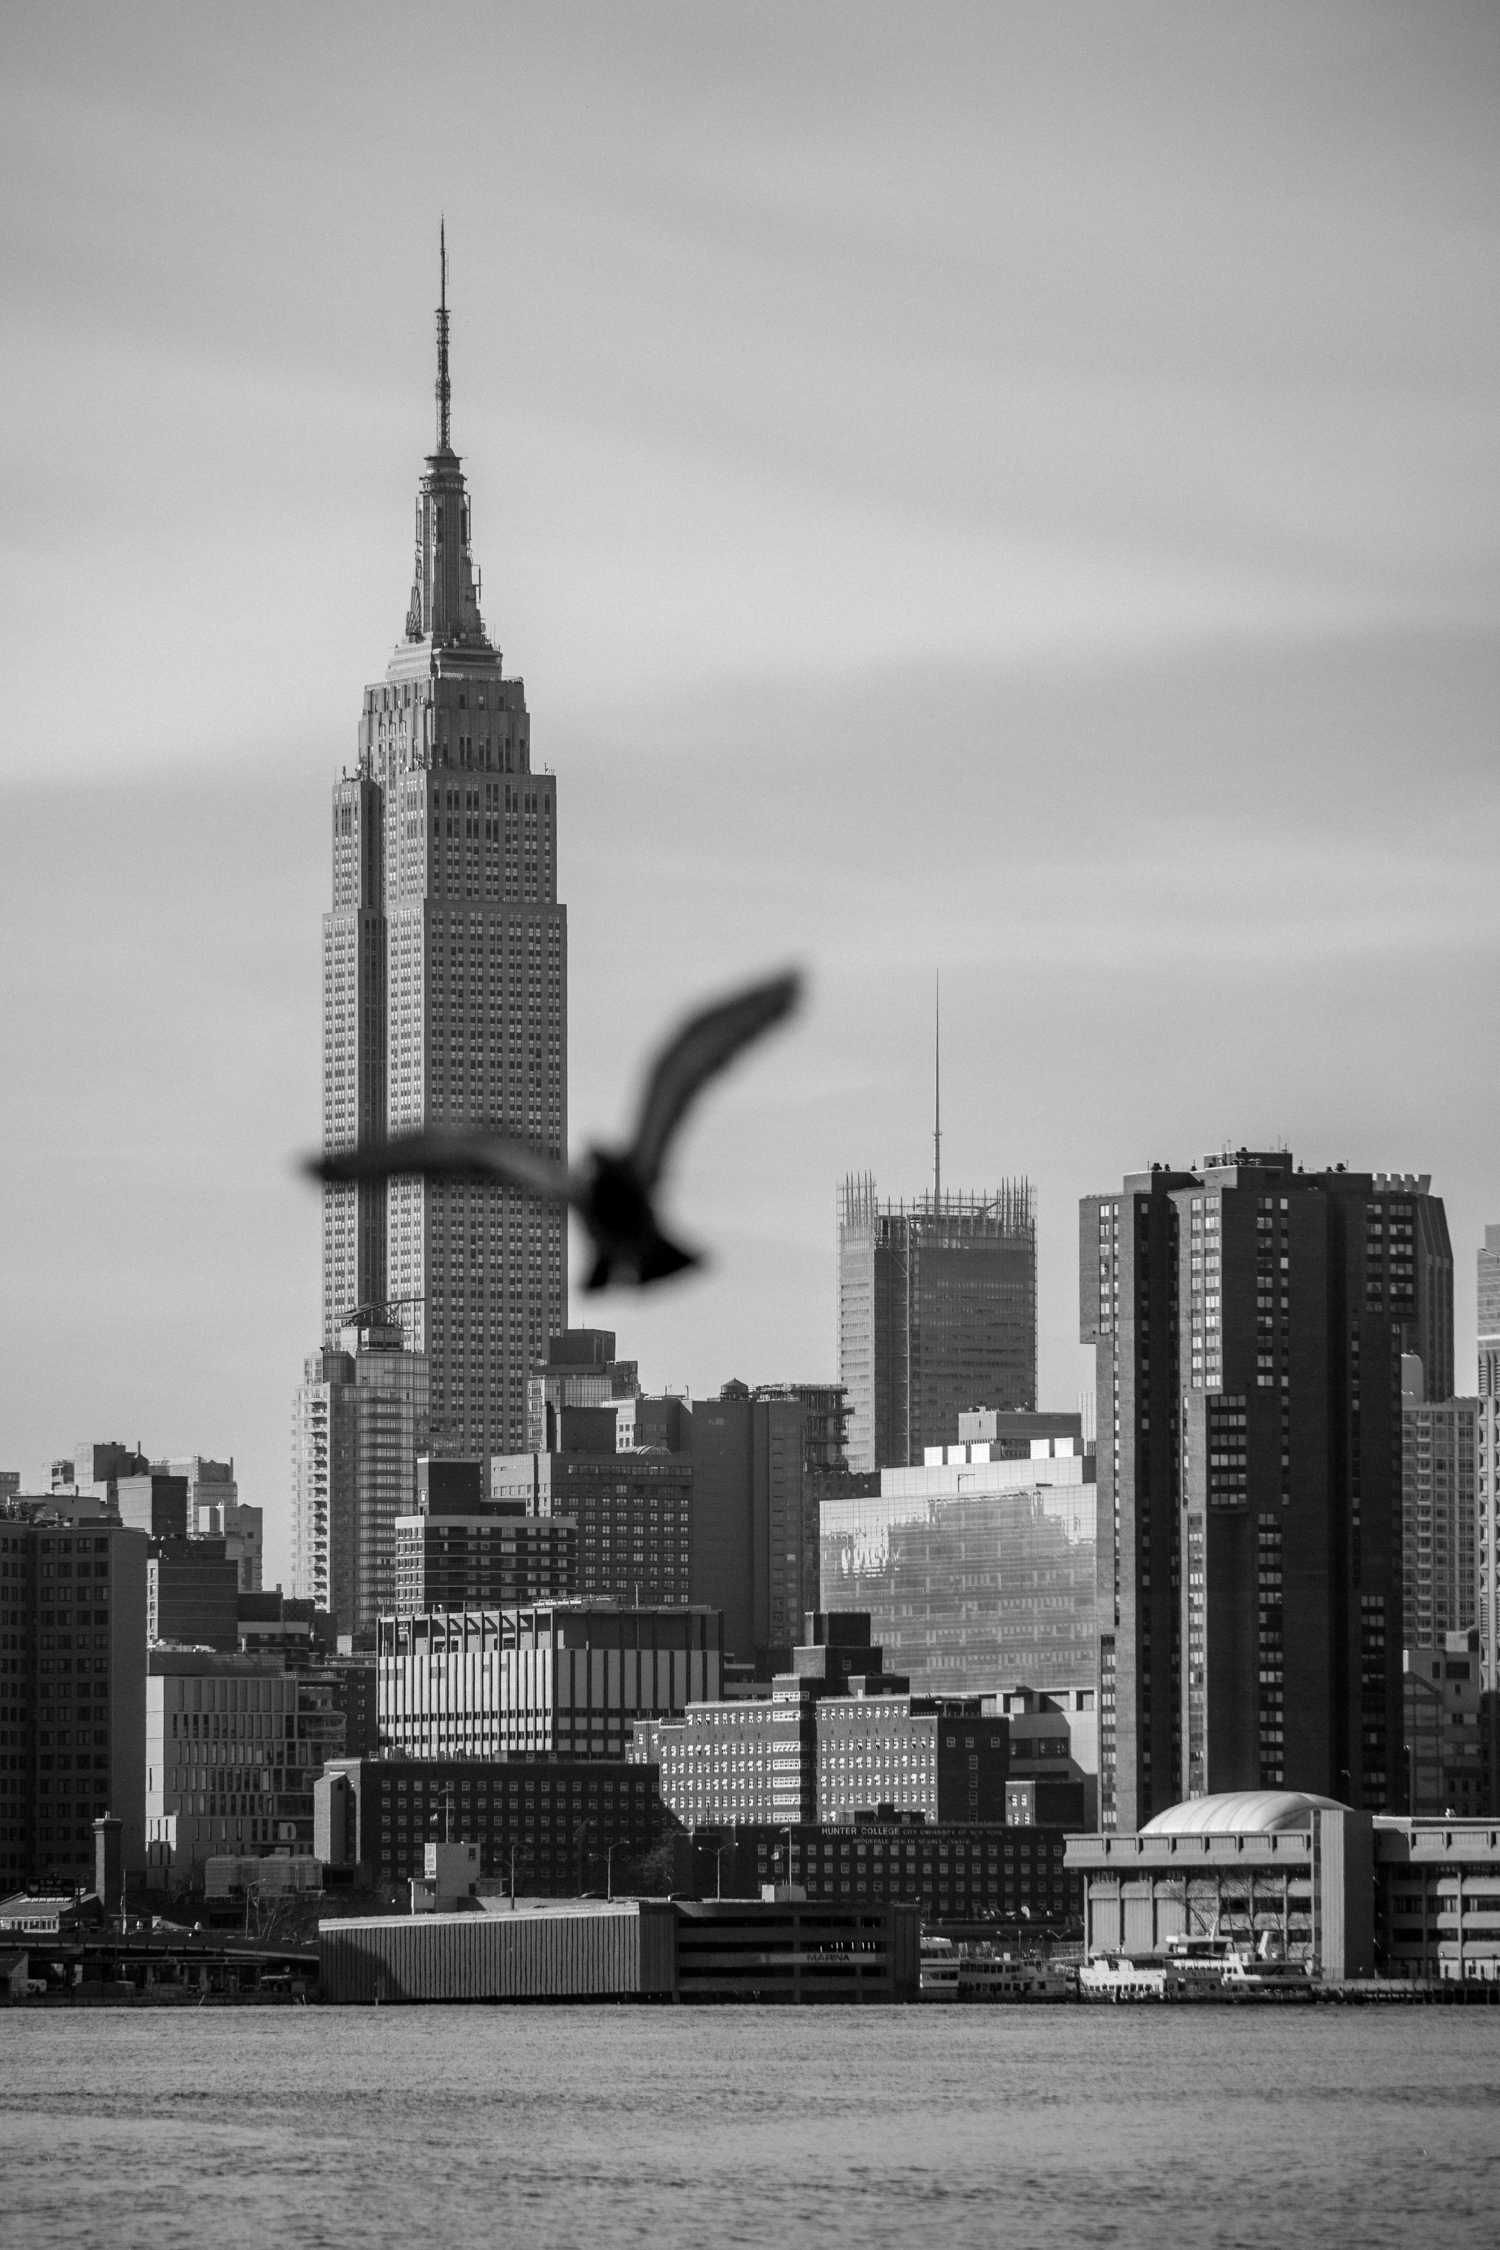 New York City Empire State